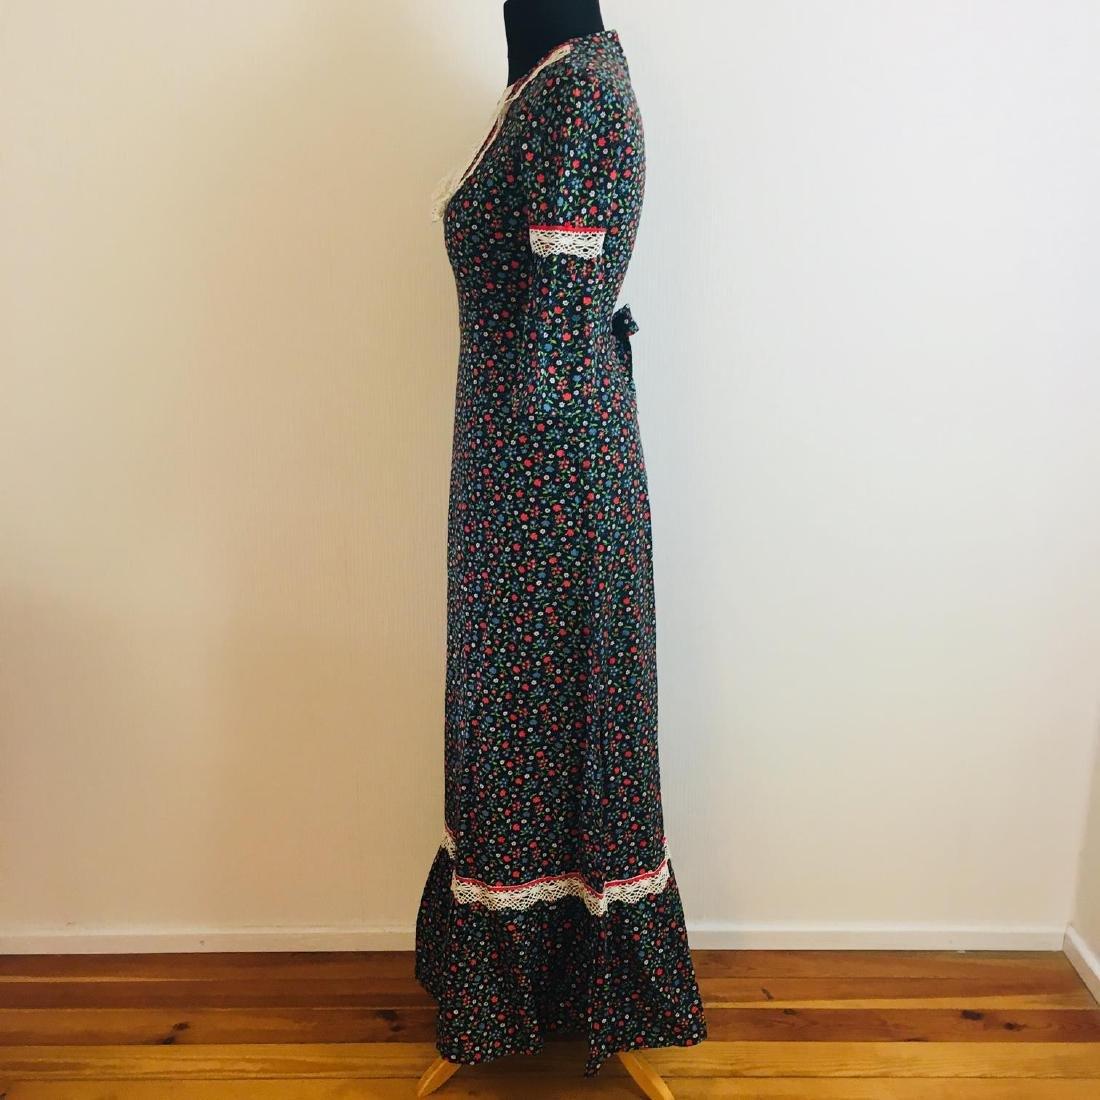 Vintage Women's Tyrolean Style Dress Size EUR 36 US 6 - 4